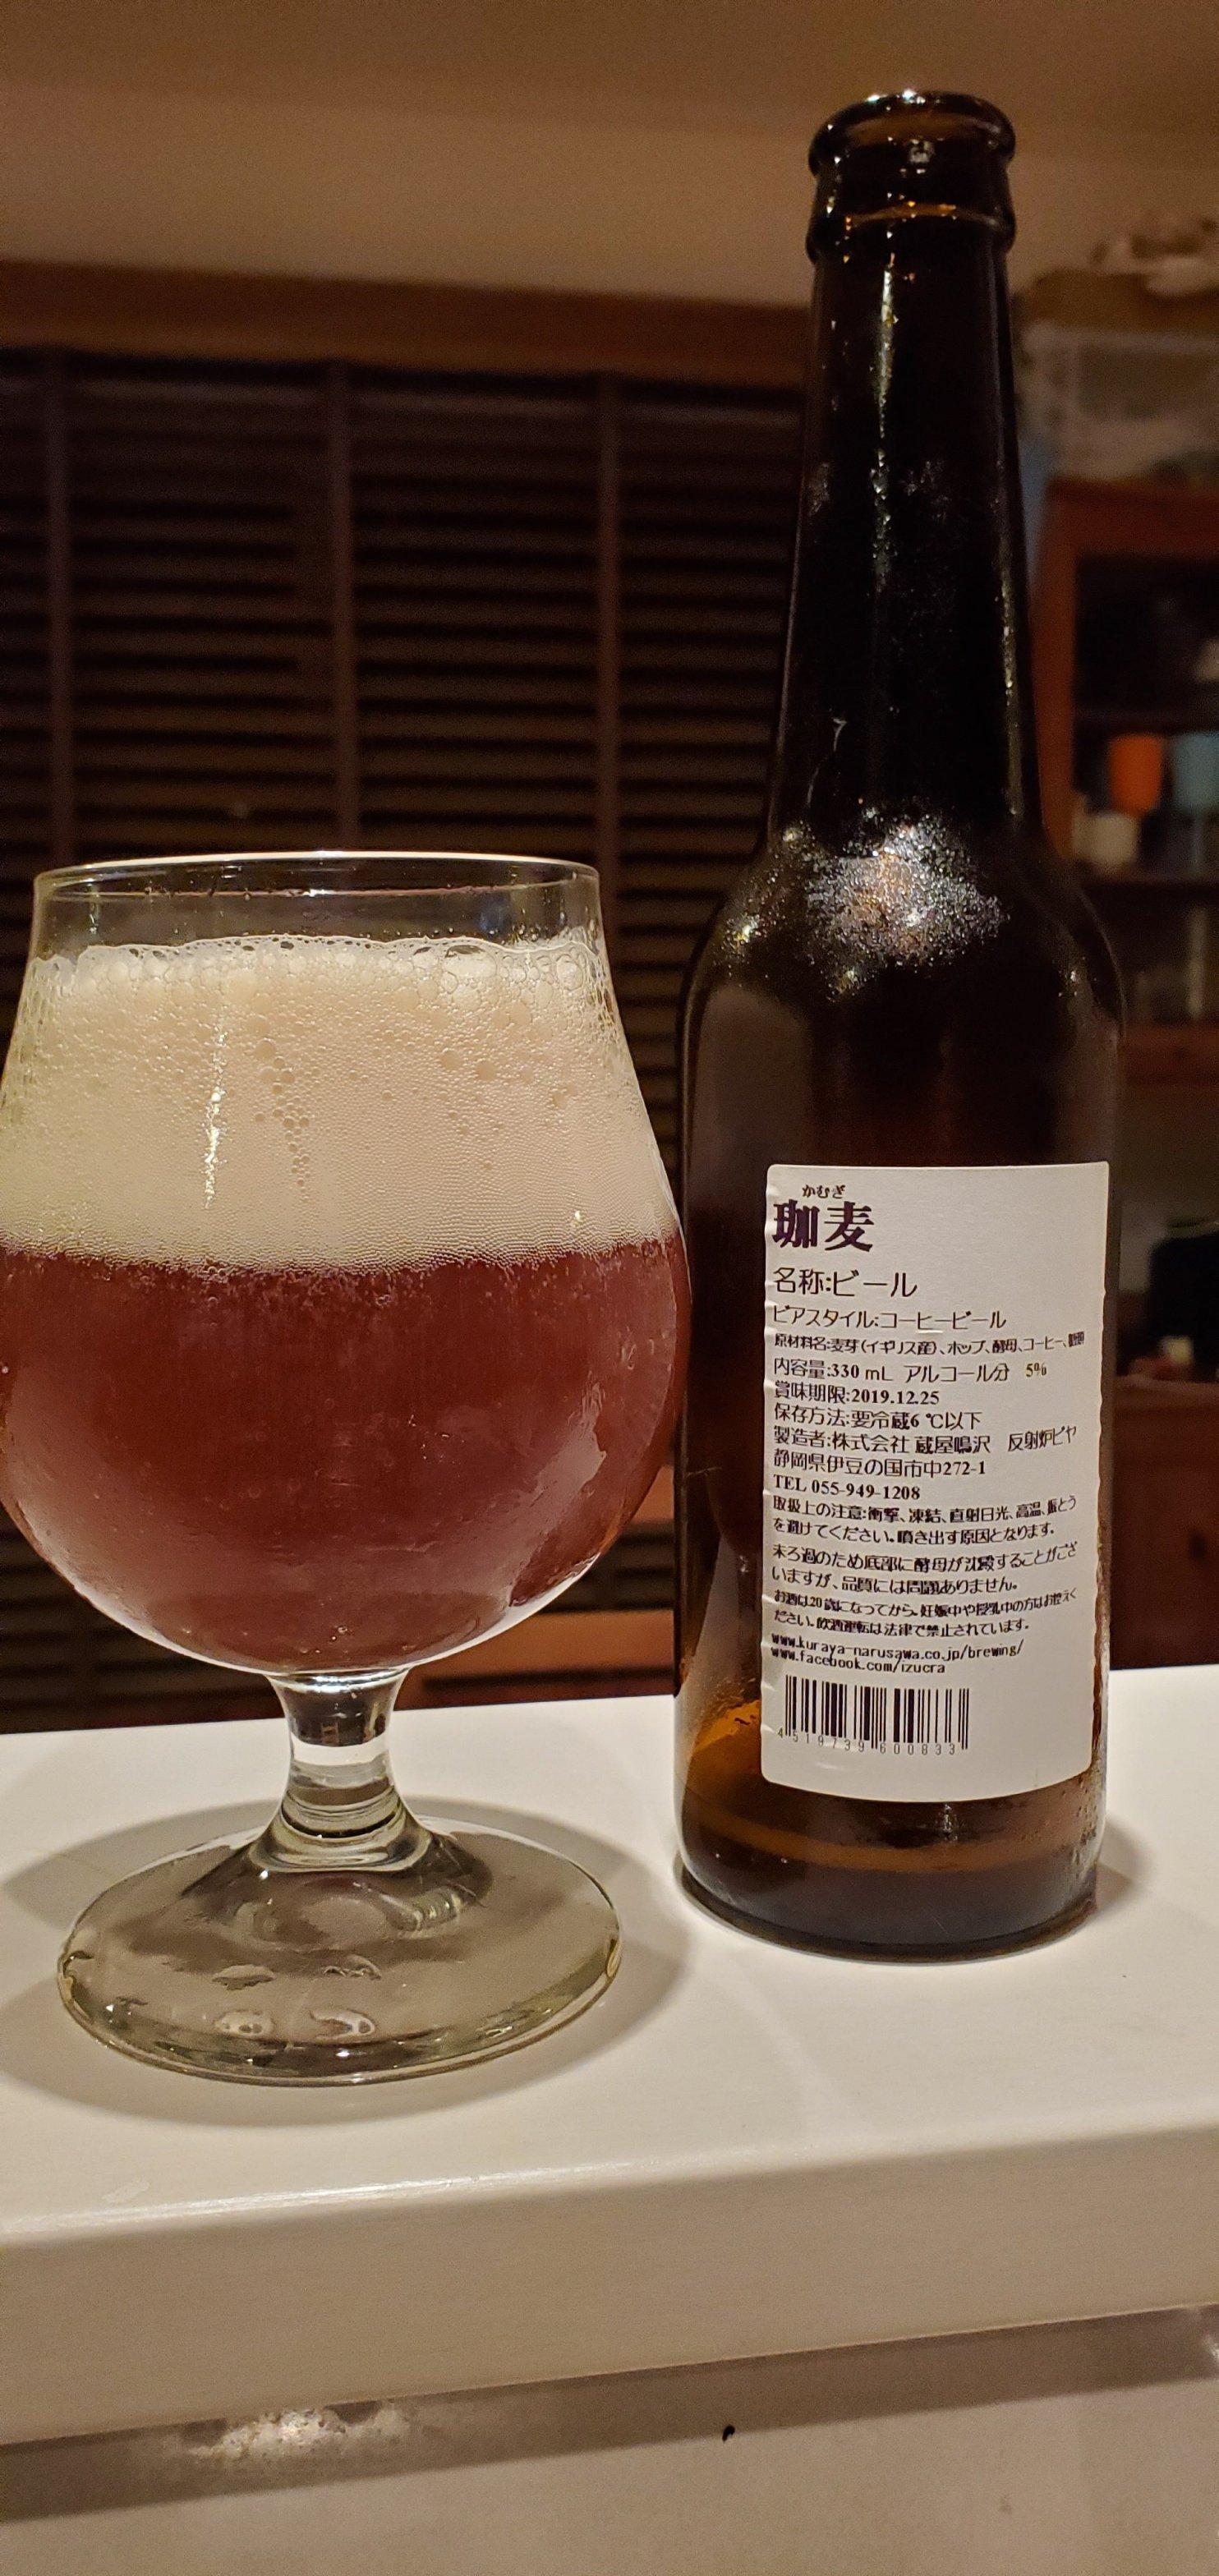 Hansharo Kamugi 2・反射炉珈麦2